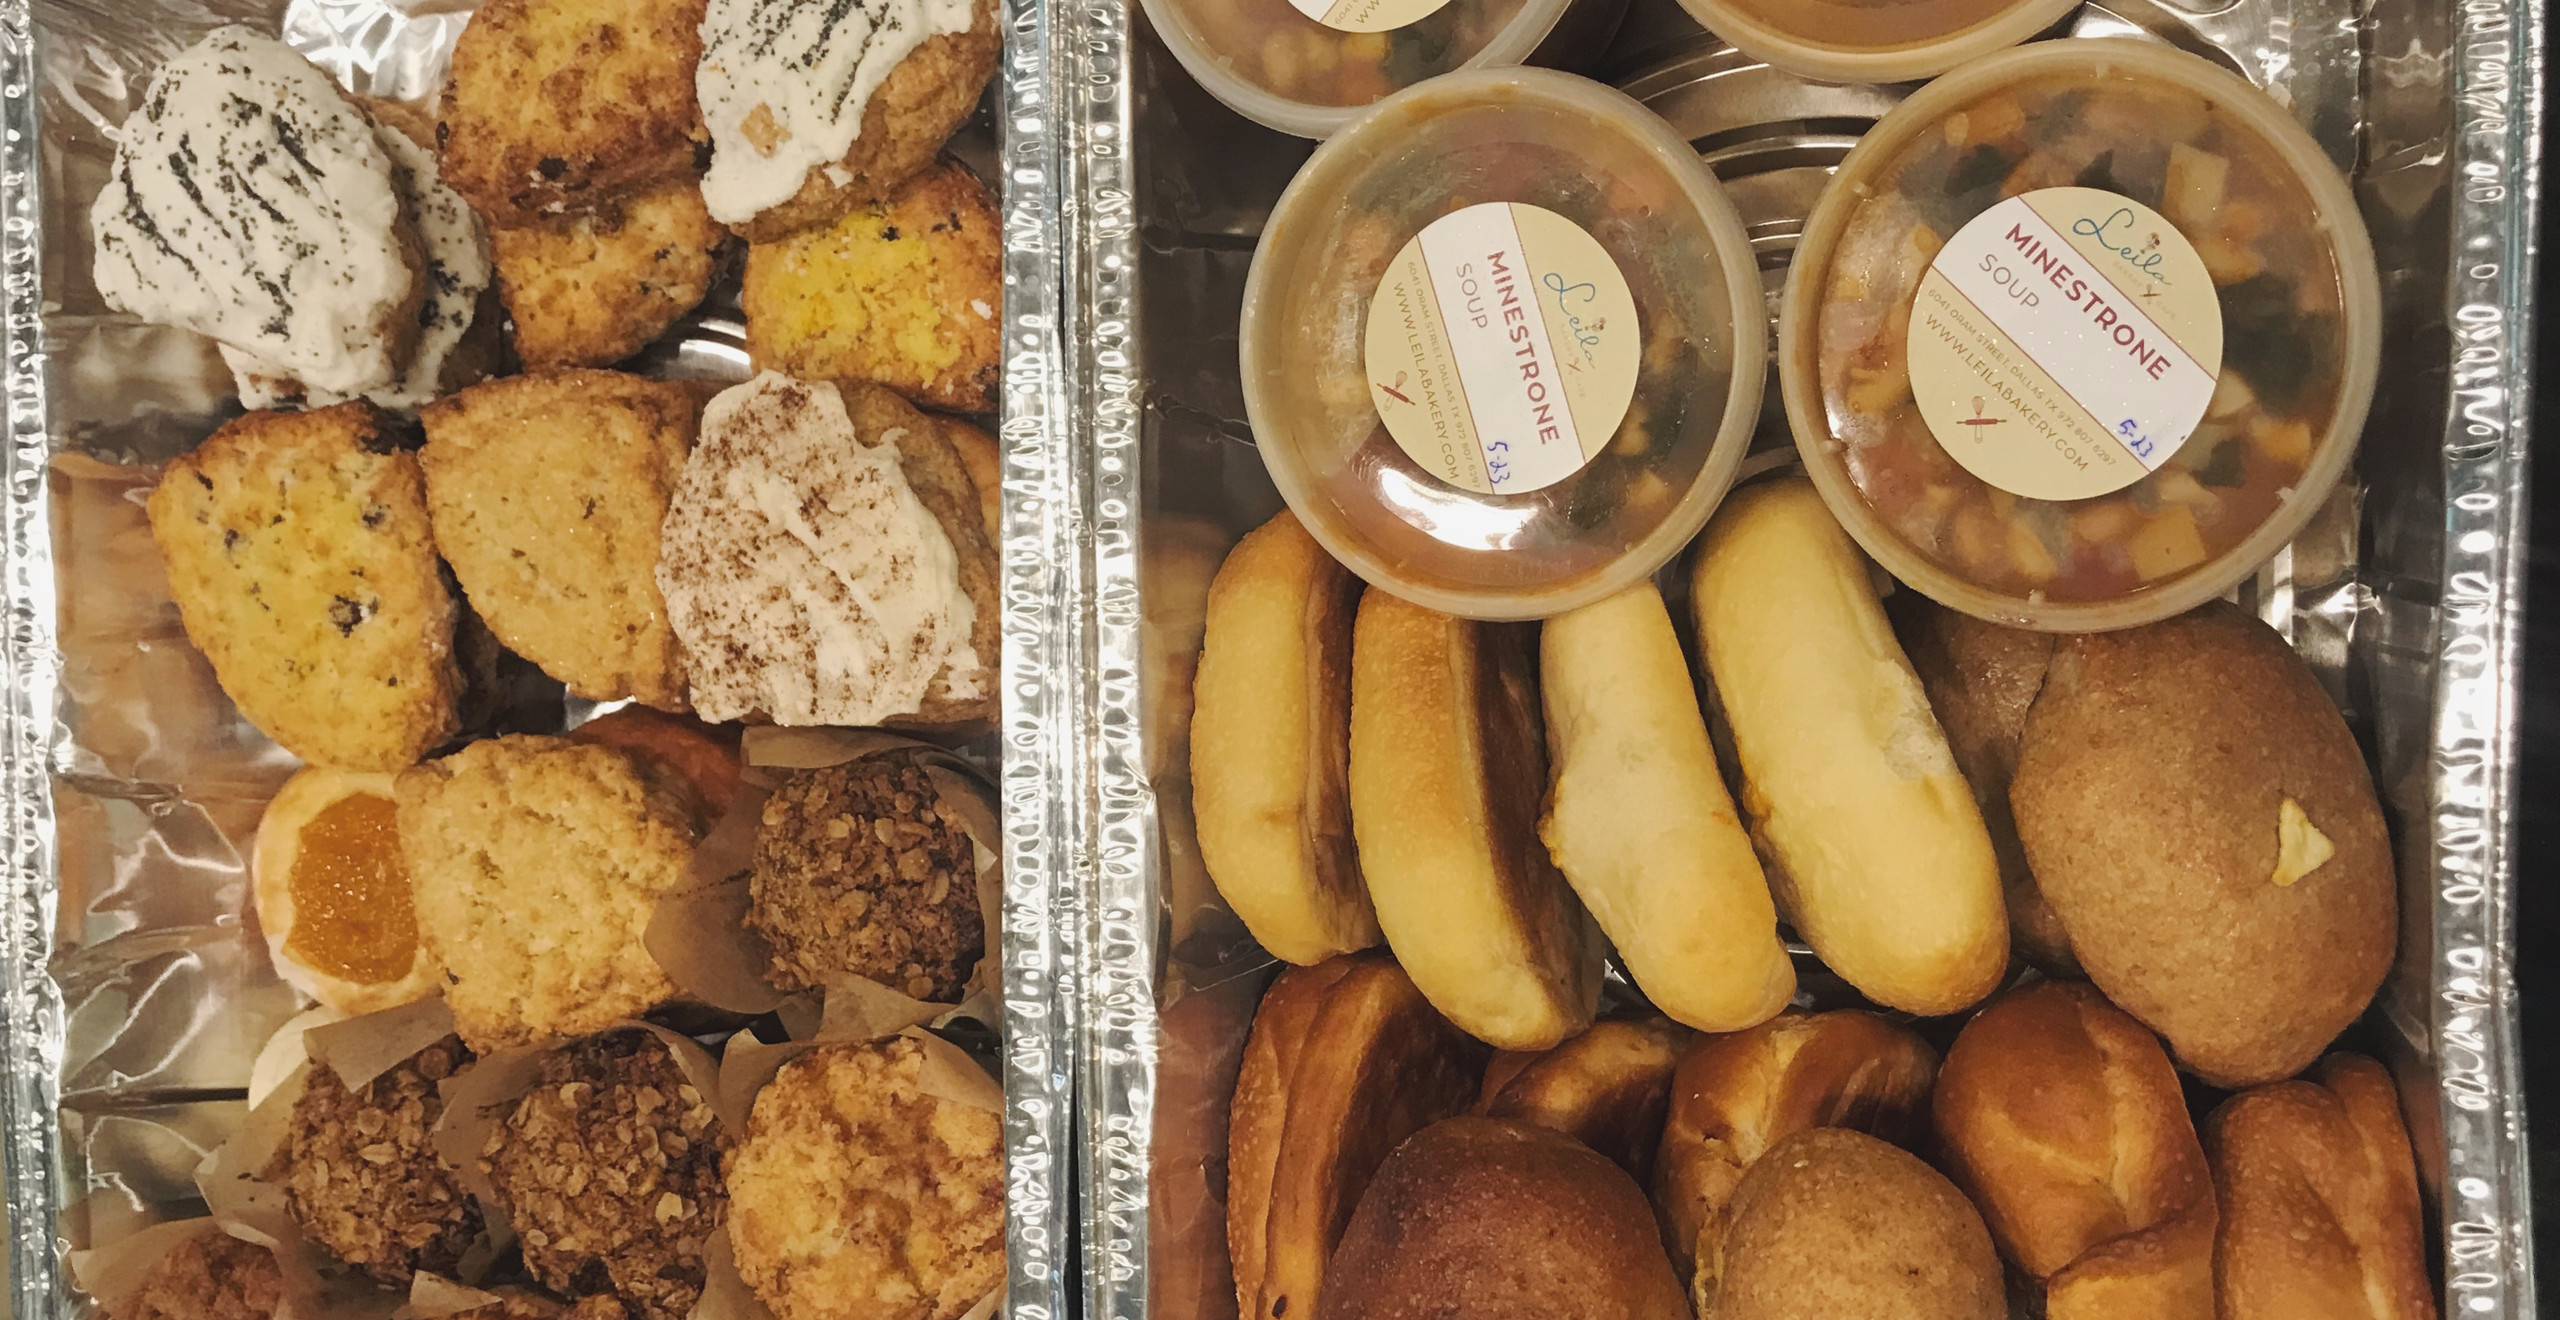 leila bakery goods